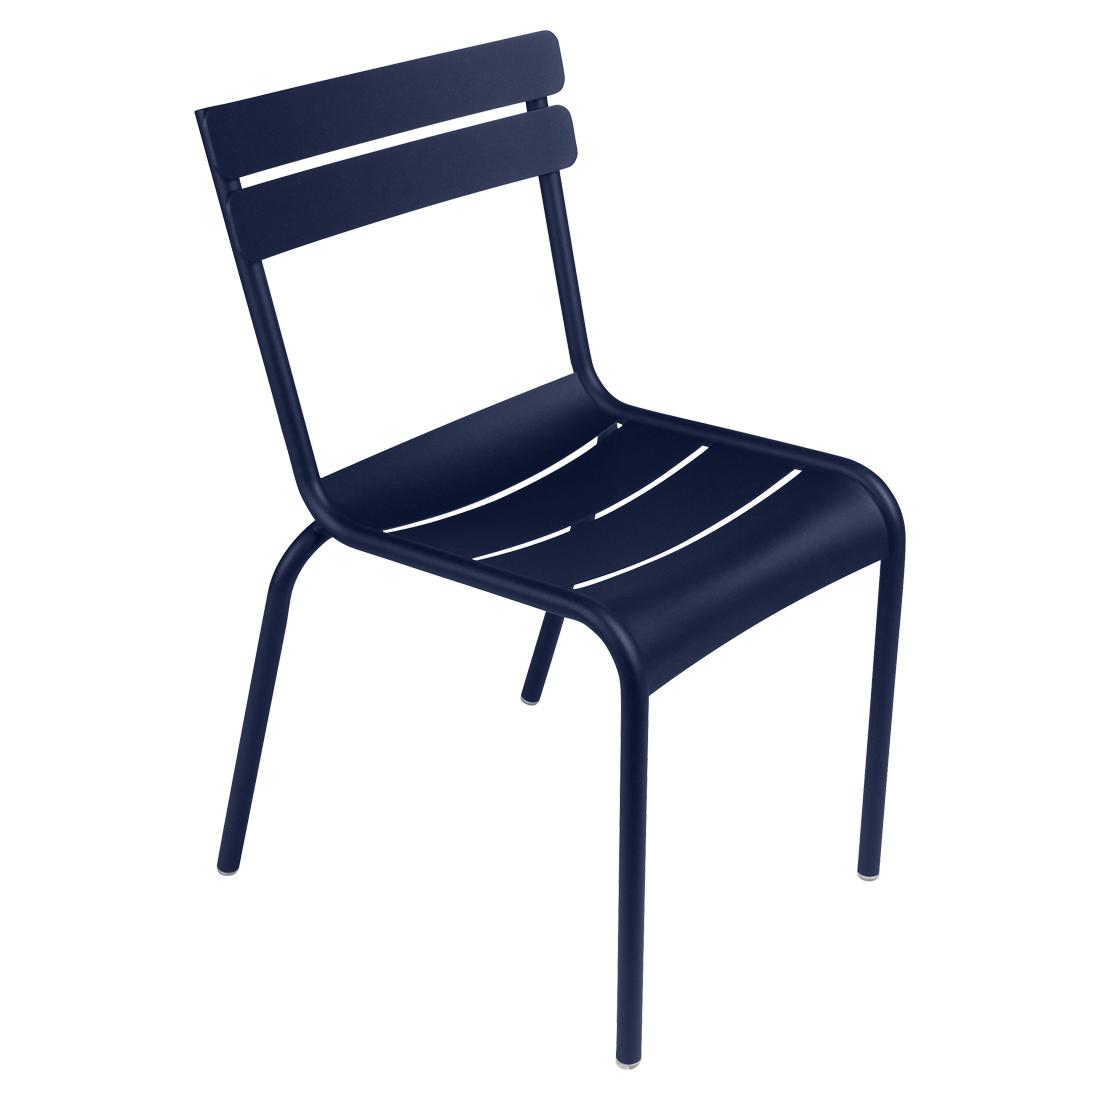 Fermob Luxembourg Stuhl Abyssblau 92 NEU Stuhl ohne Armlehnen